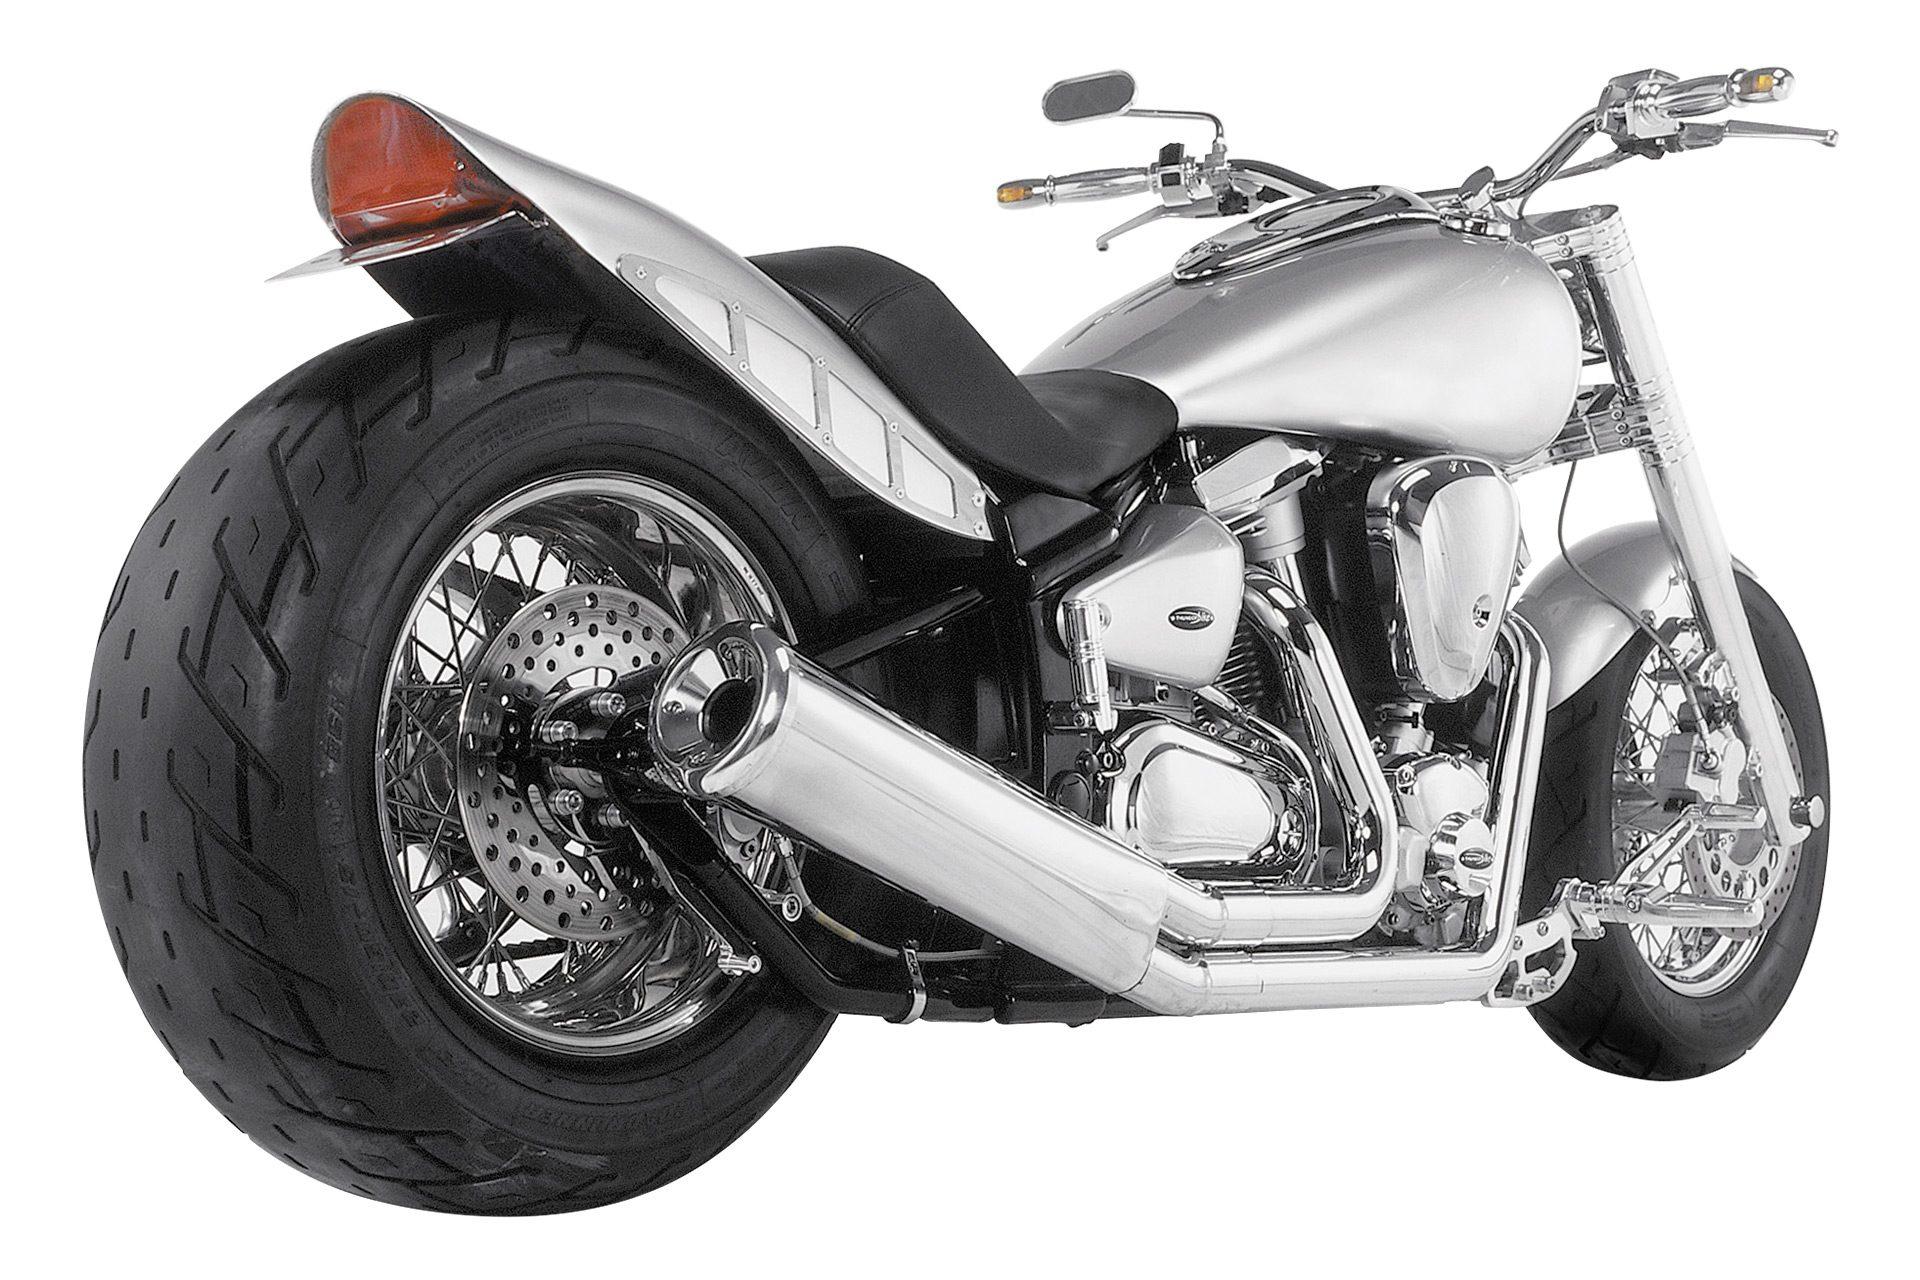 Thunderbike XV1600 History • Custombike & Harley-Davidson Gallery